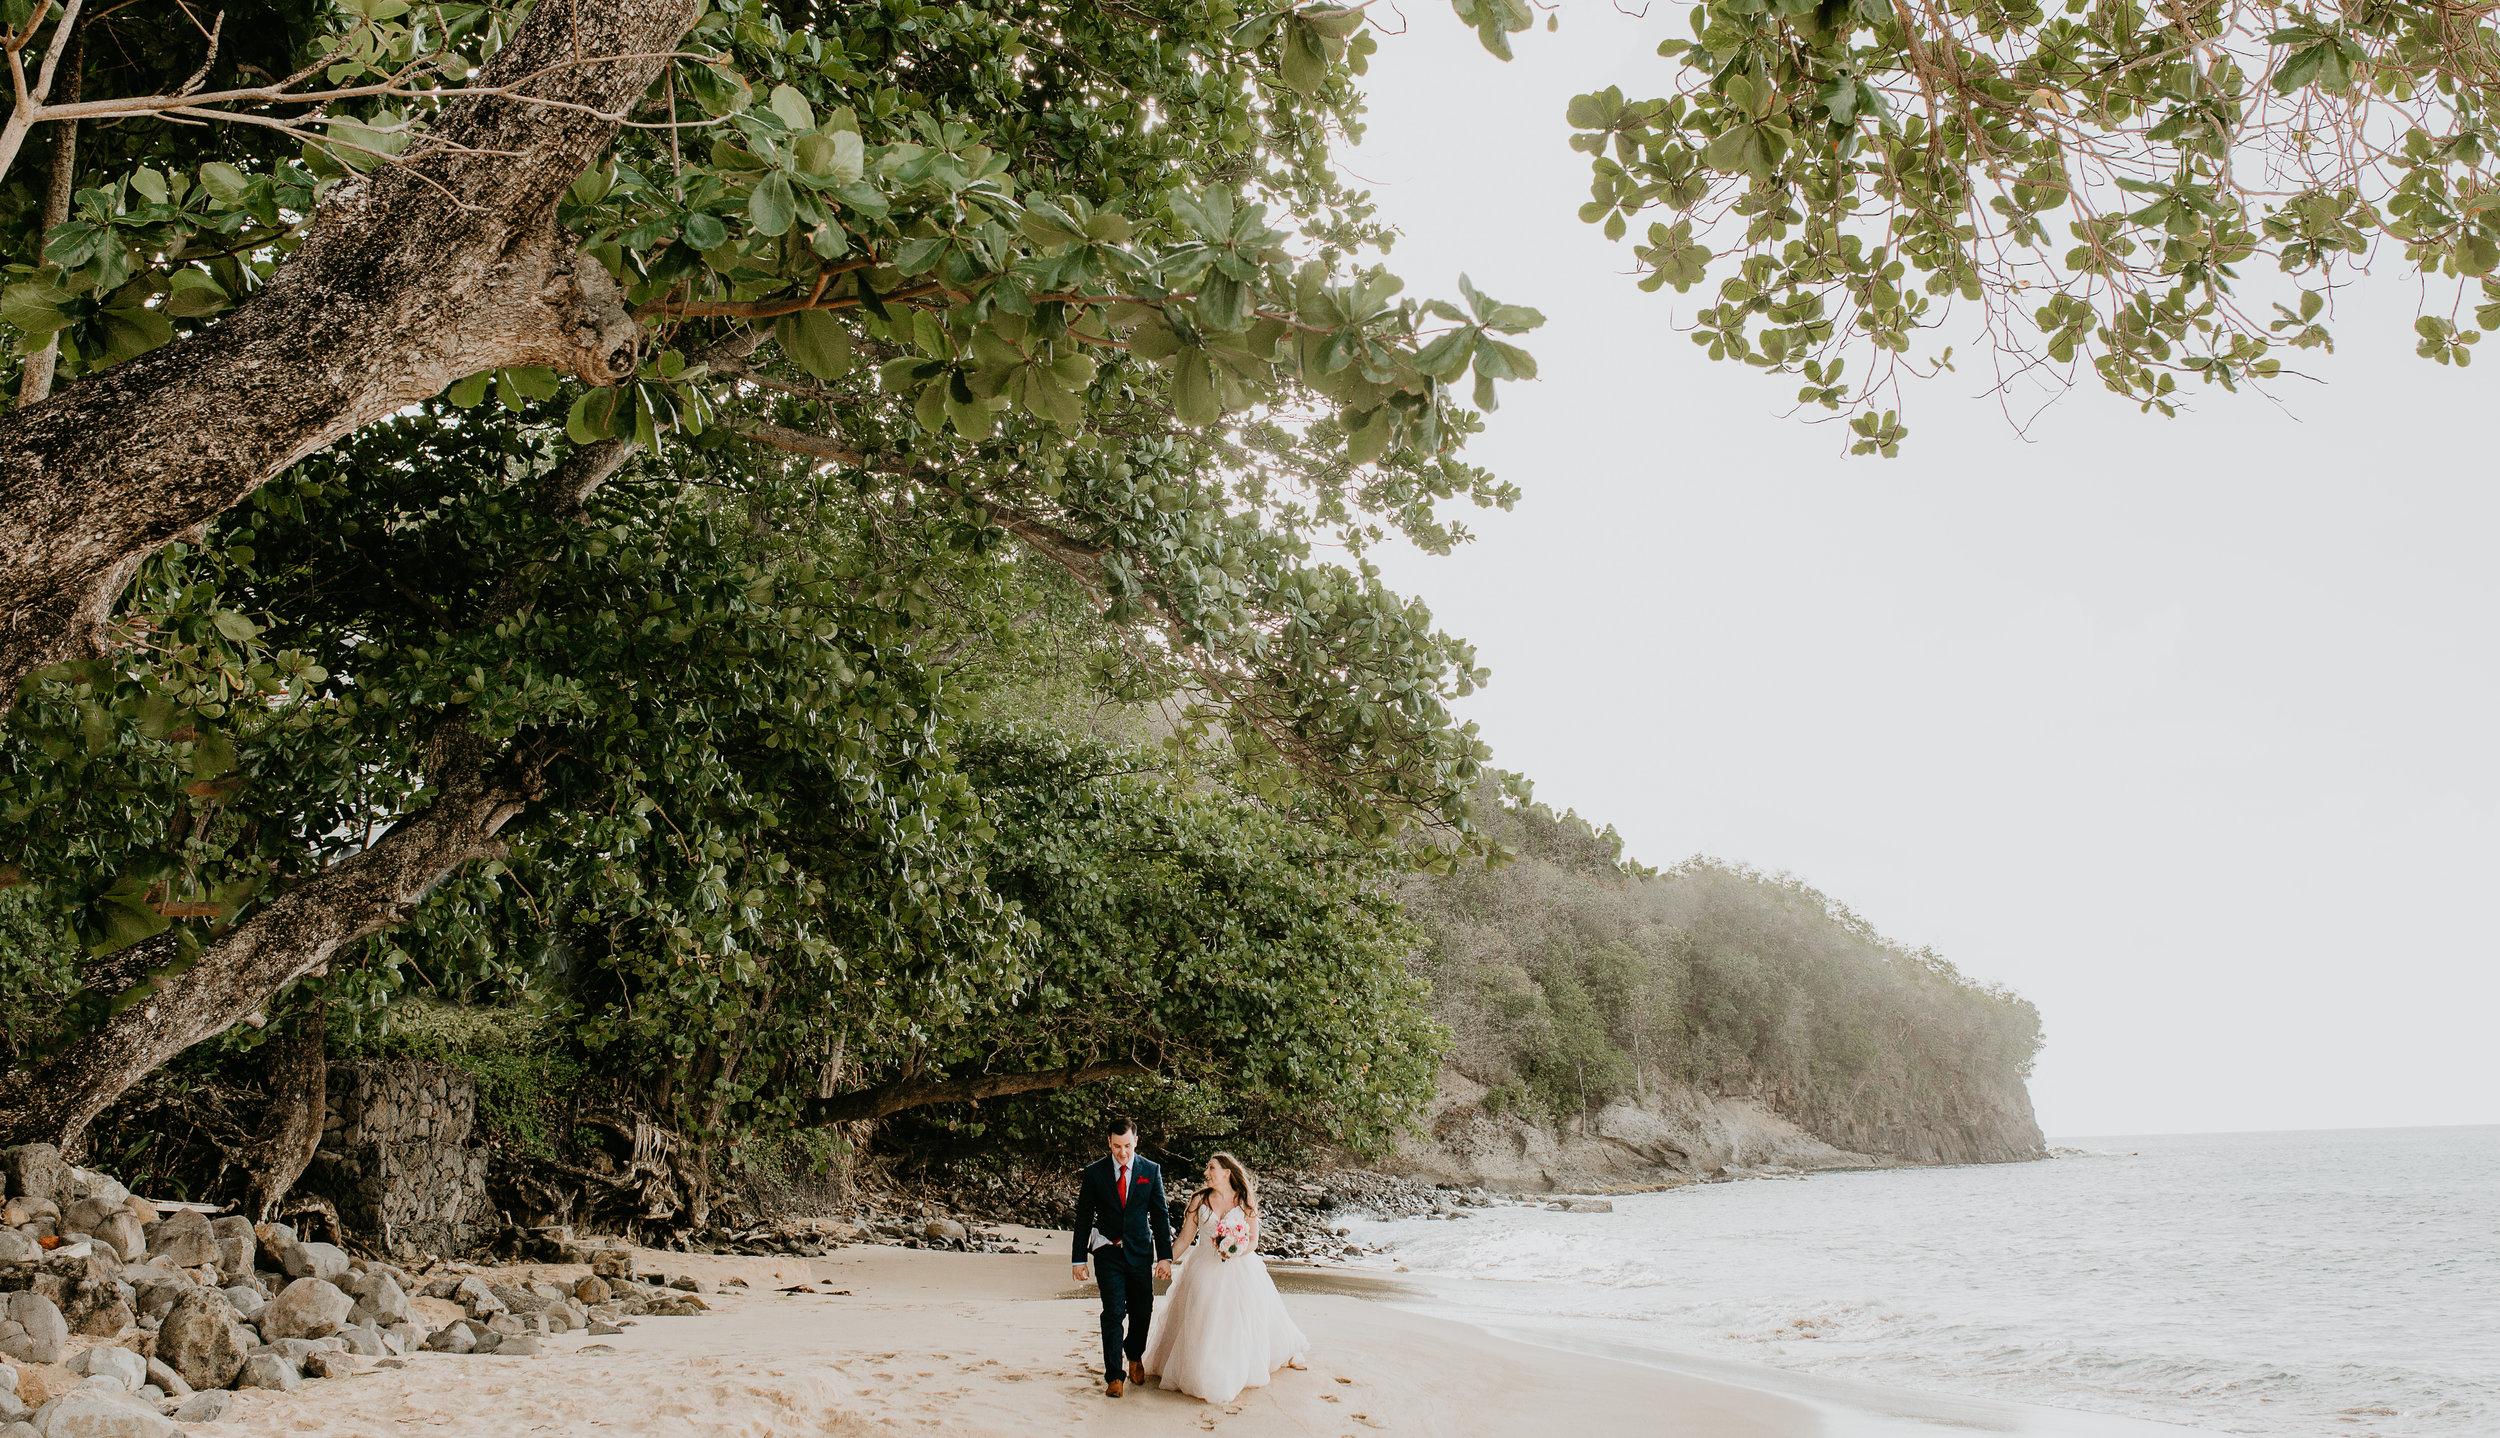 nicole-daacke-photography-destination-wedding-in-st-lucia-sandals-la-toc-intimate-island-wedding-carribean-elopement-photographer-chill-island-wedding-84.jpg